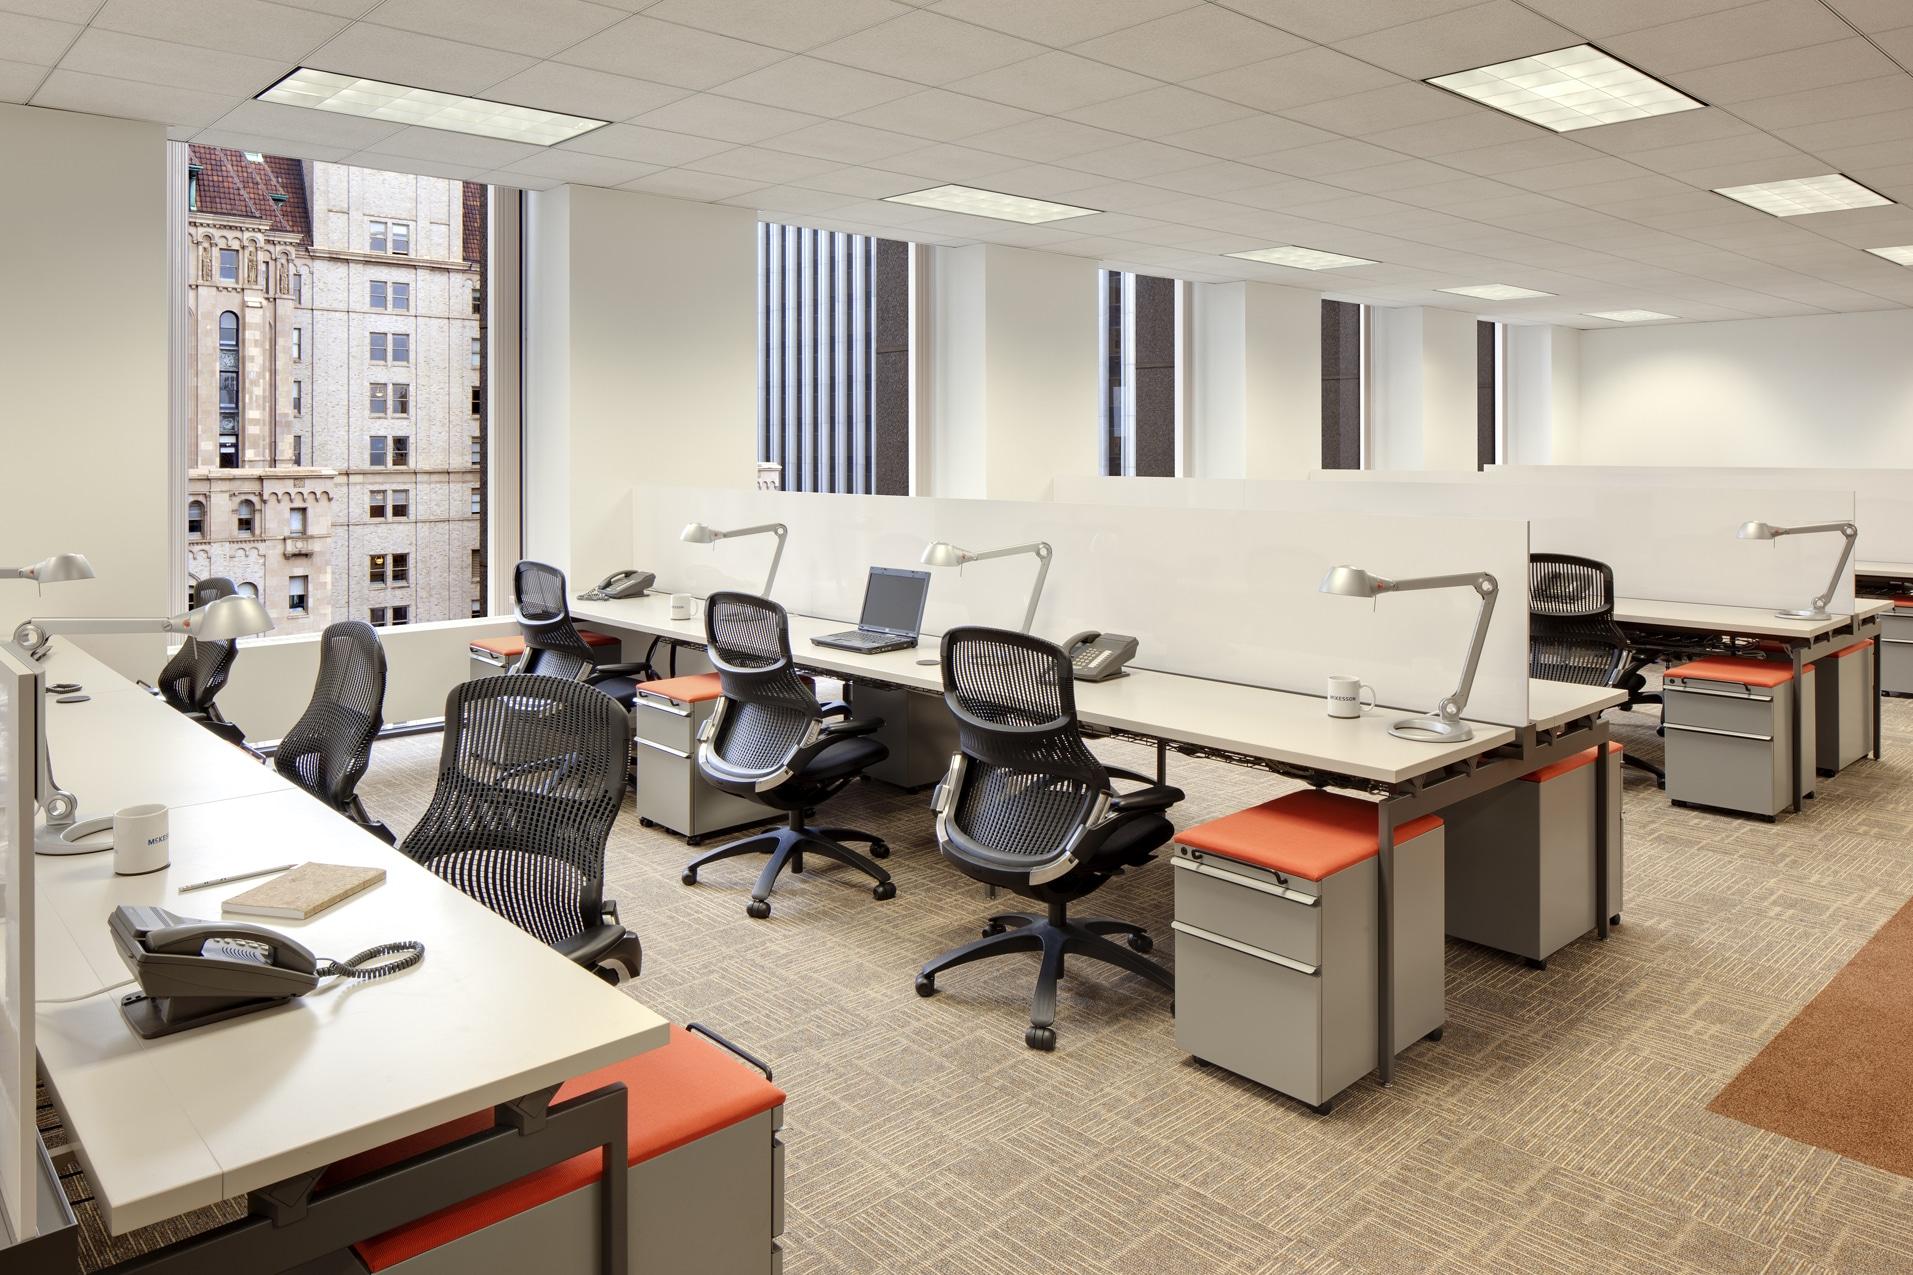 Ukuran meja kantor